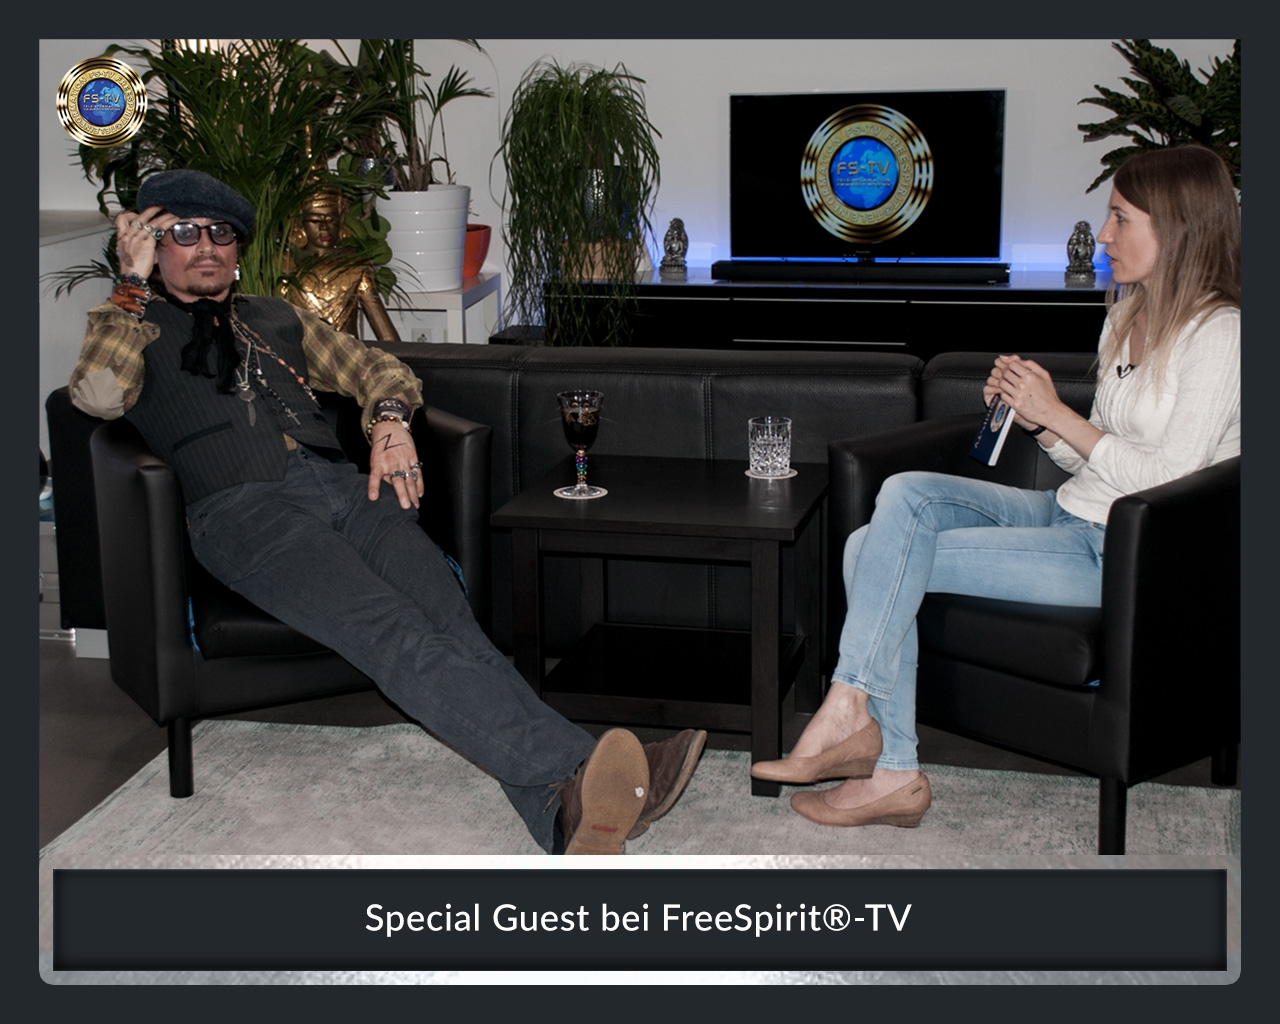 FS-TV-Bildergallerie-Special-Guest-6